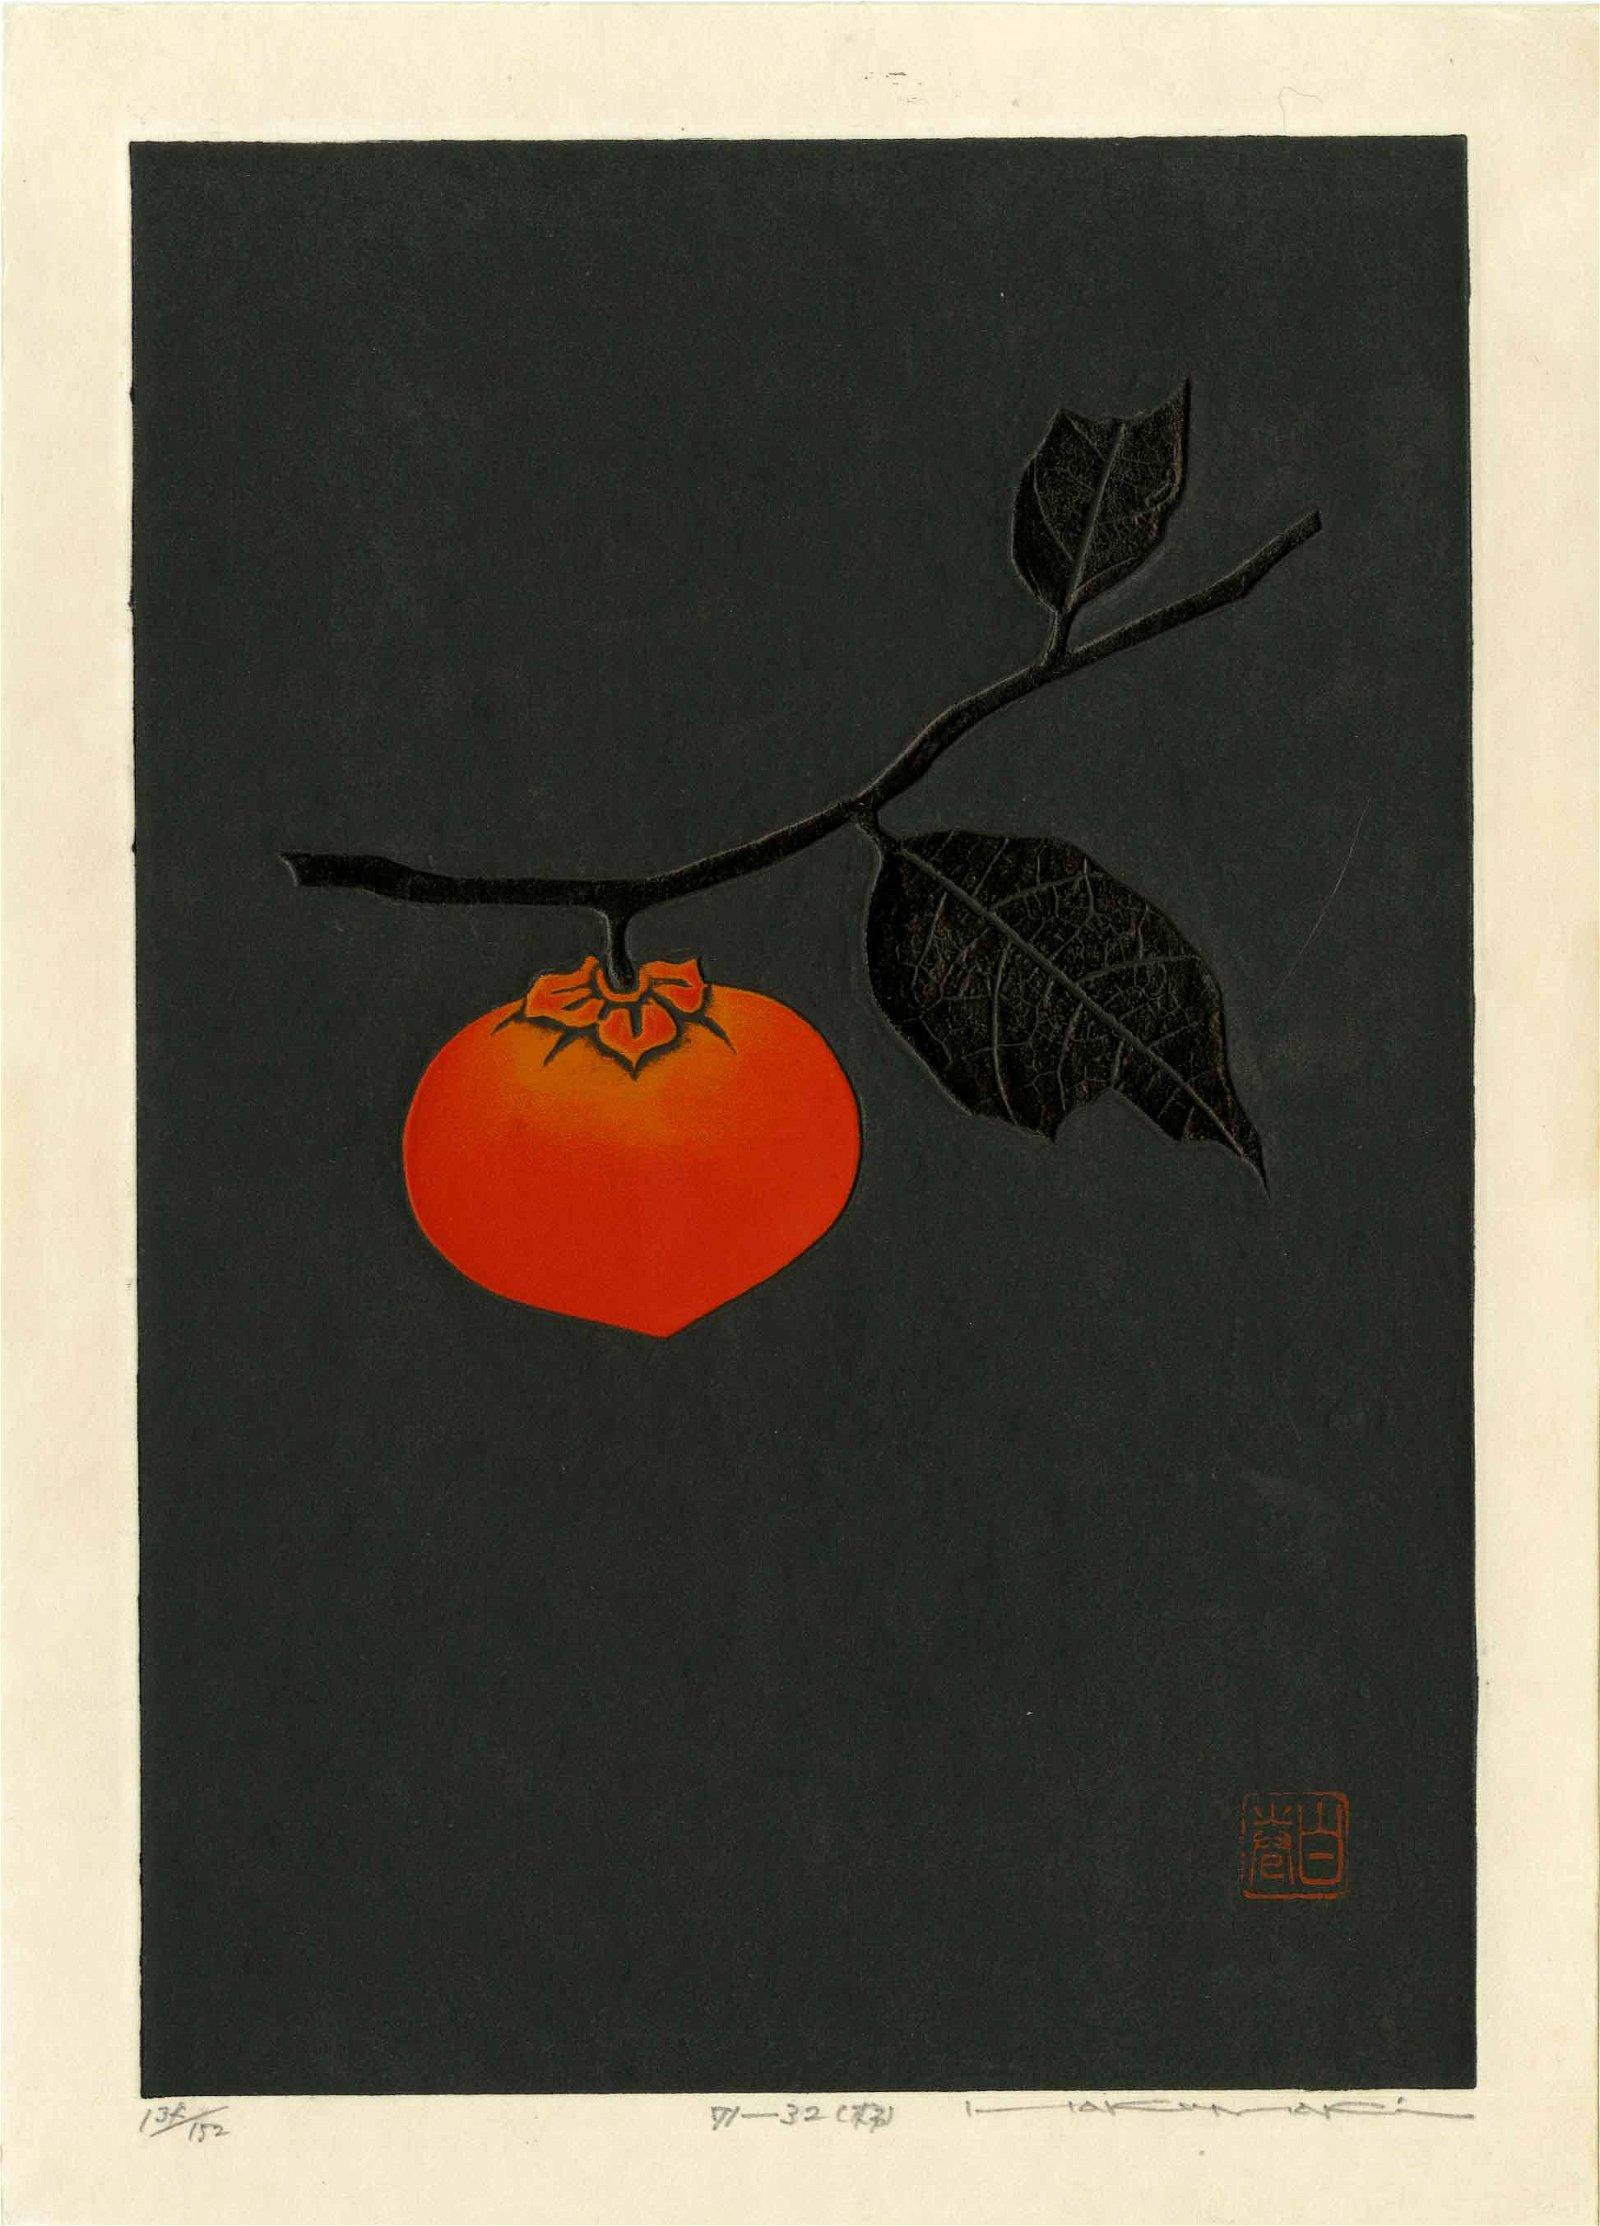 Haku Maki: Persimmon 1971 1st Ed. Woodblock